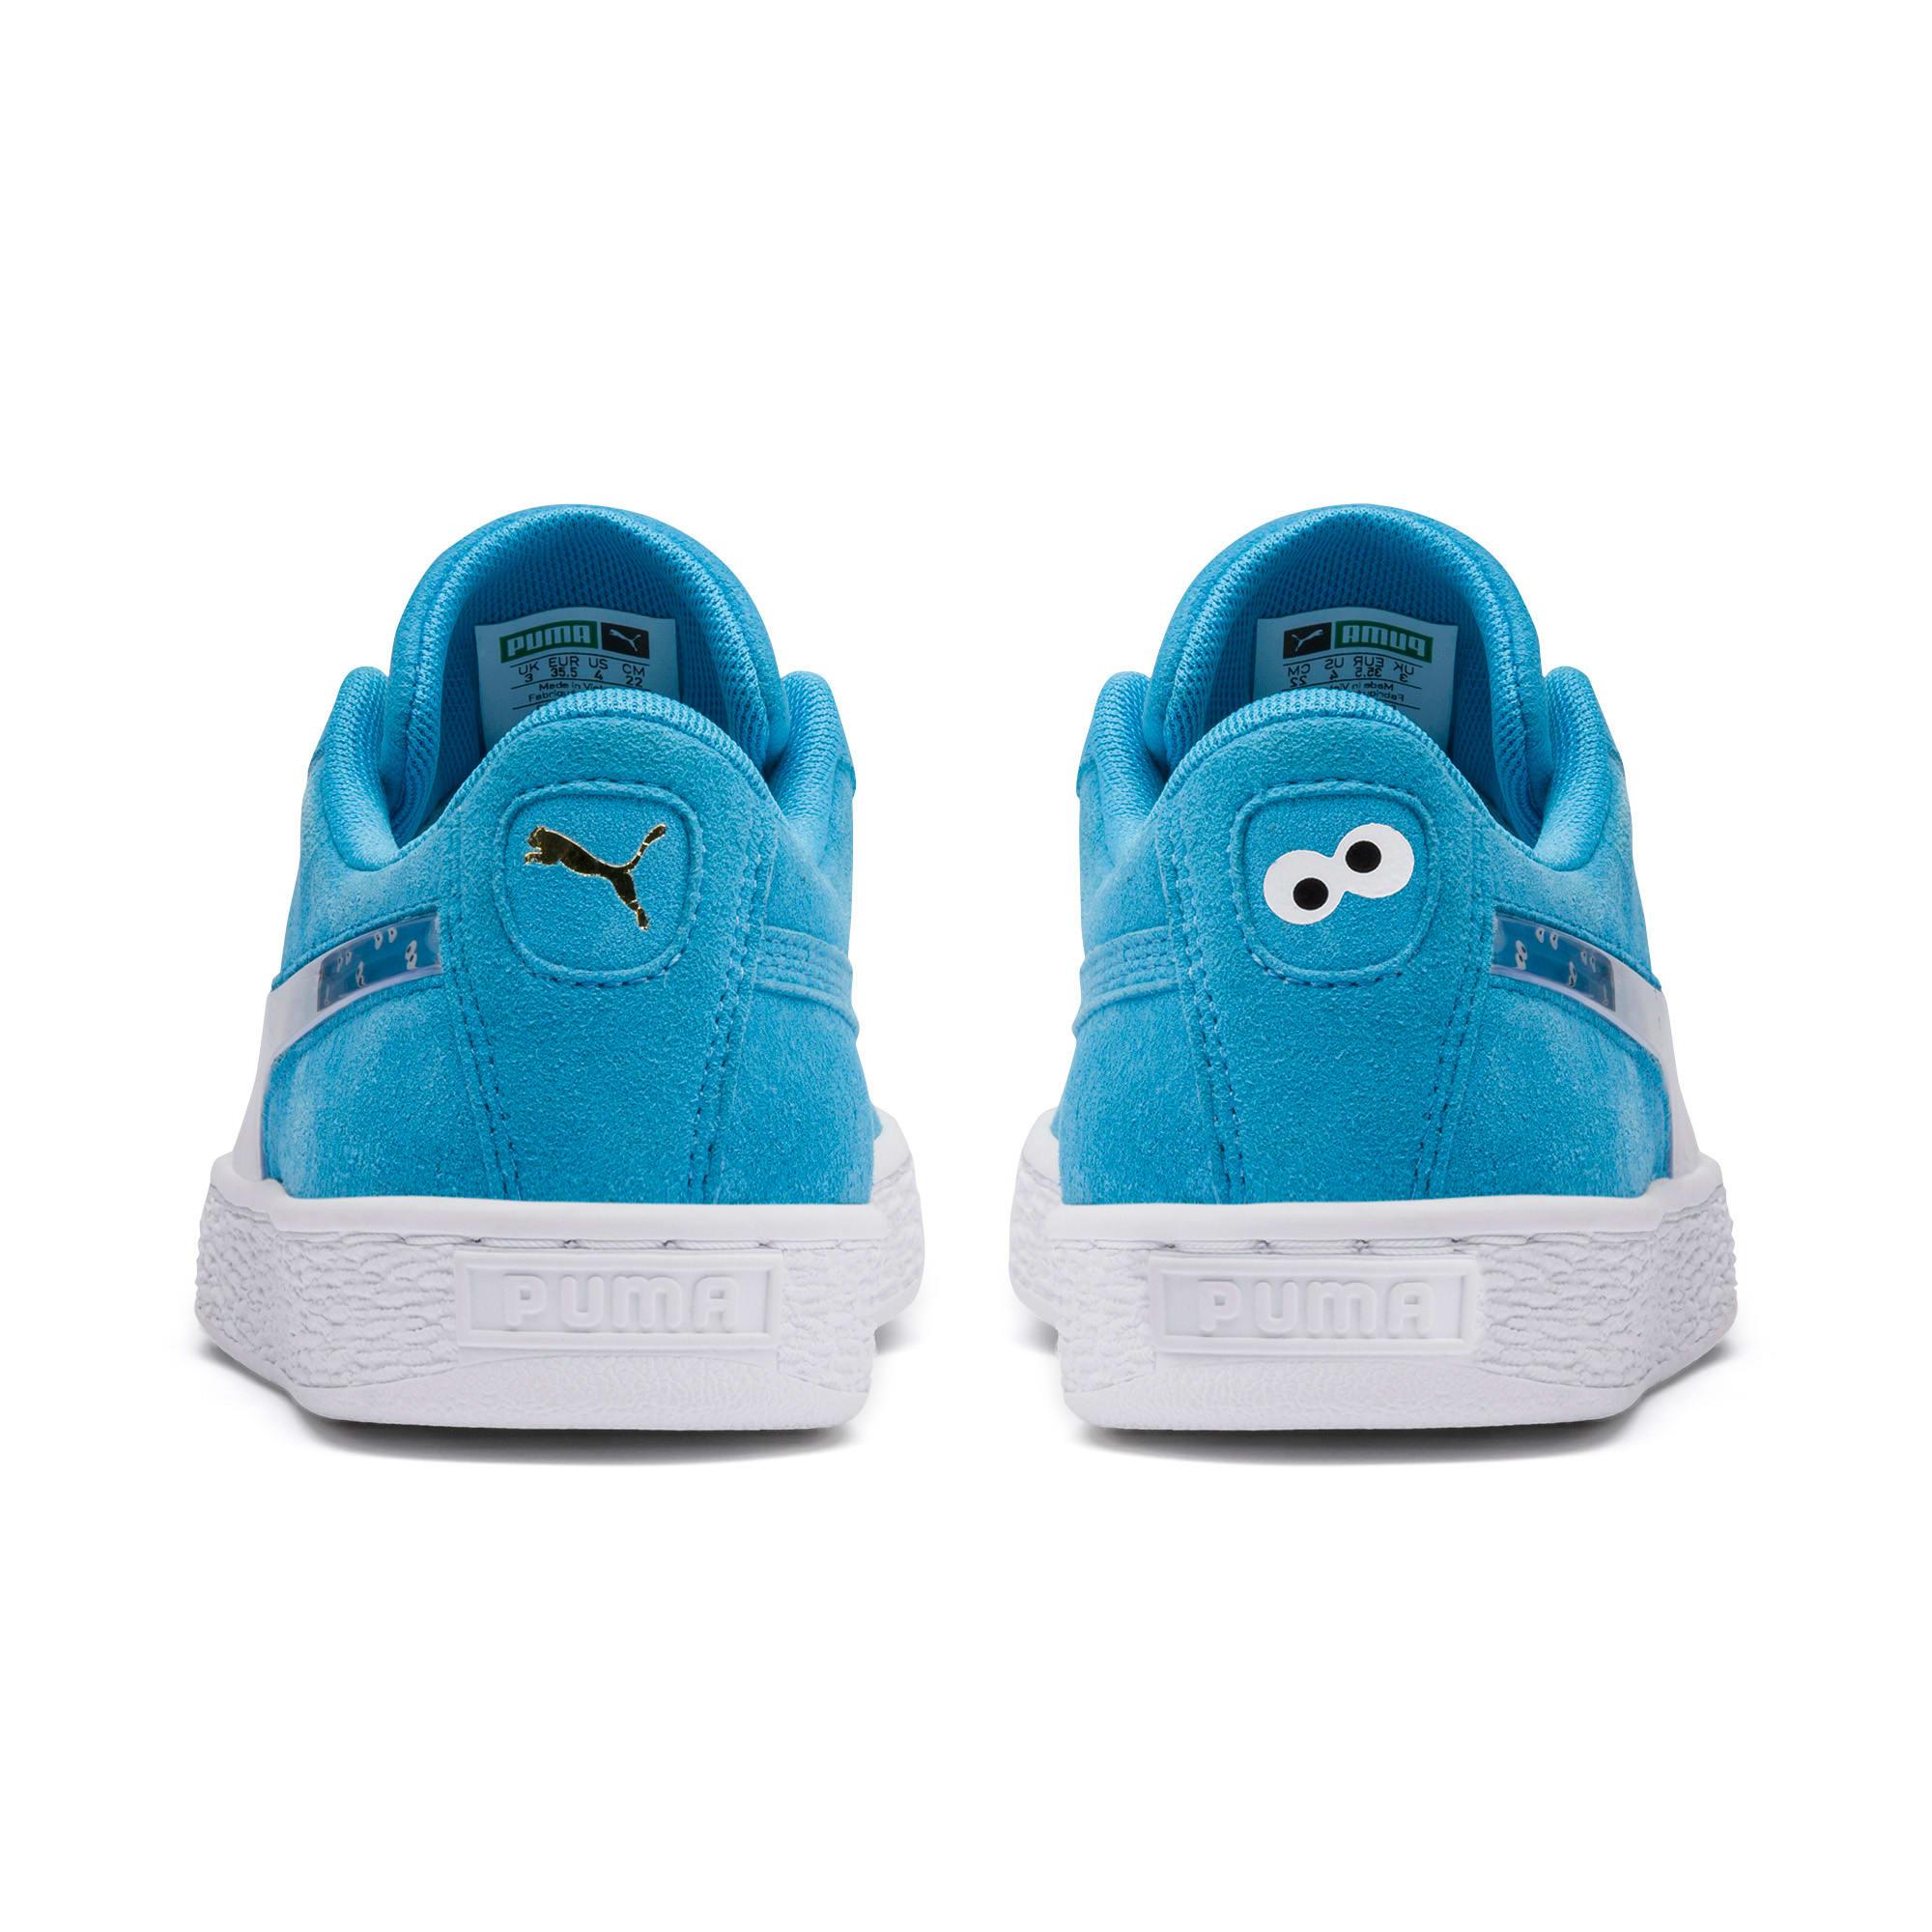 Thumbnail 3 of PUMA x SESAME STREET 50 Suede Statement Sneakers JR, Bleu Azur-Puma White, medium